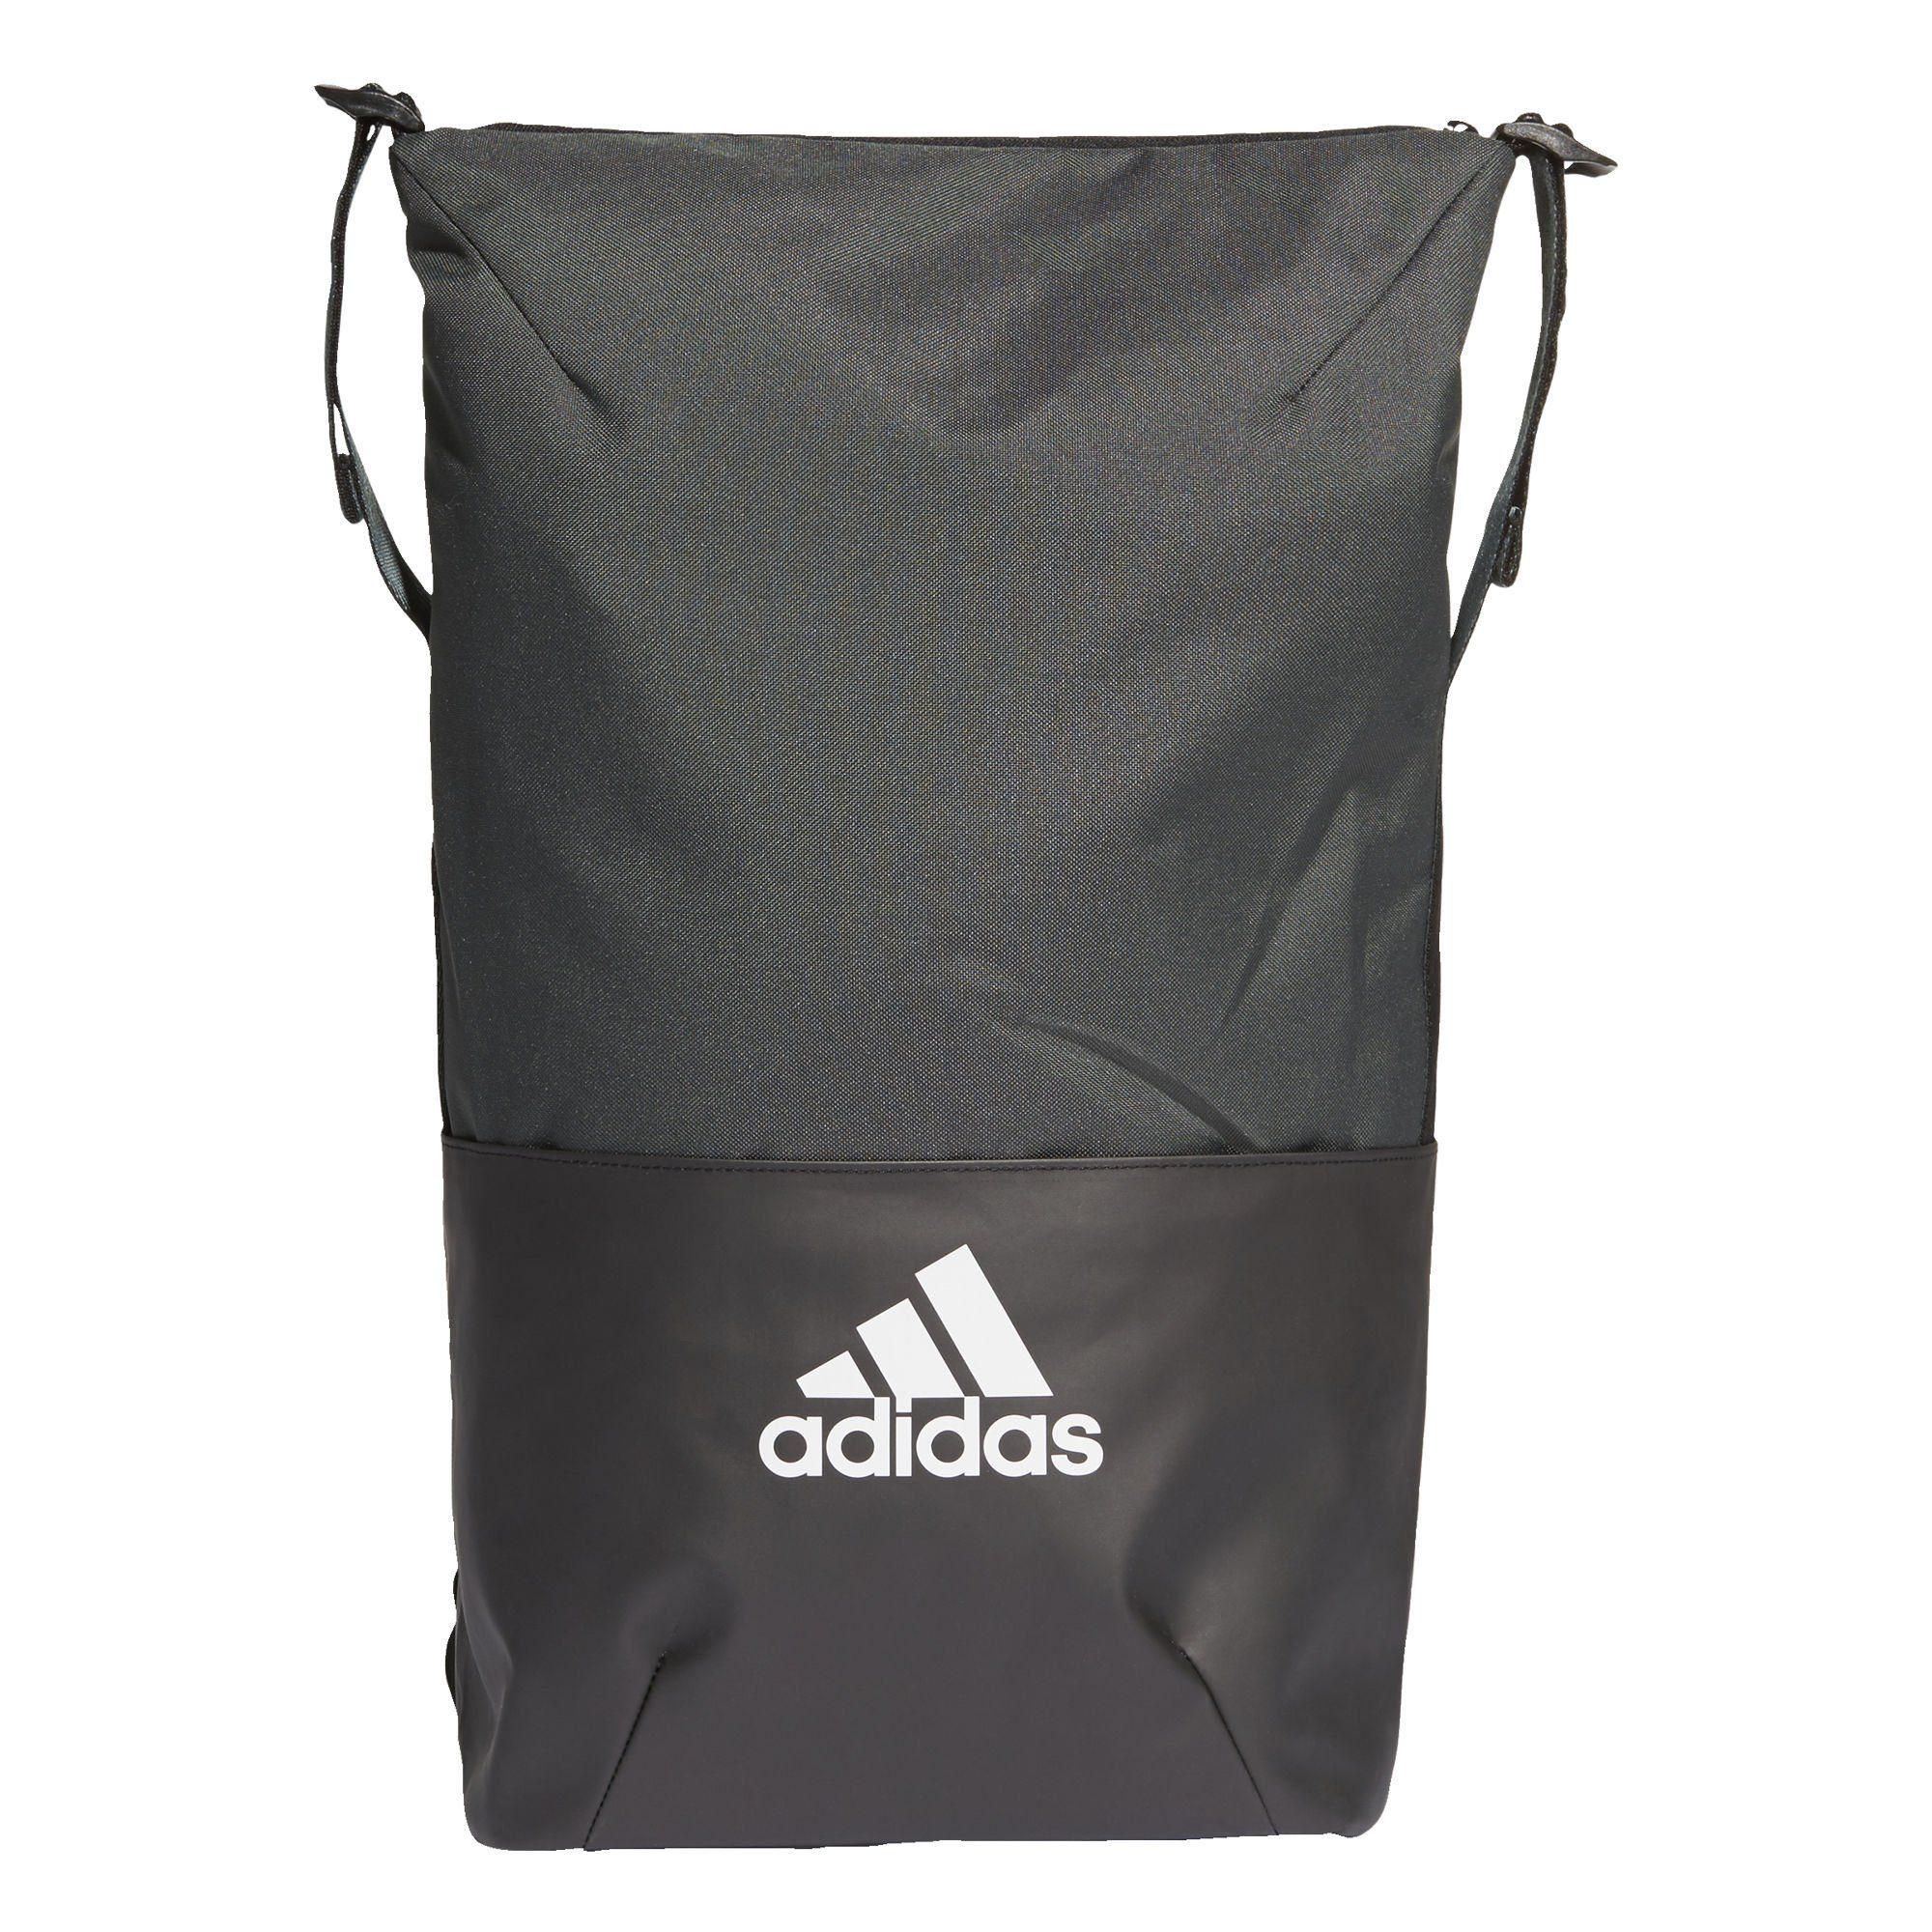 adidas Performance Daypack »adidas Z.N.E. Core Rucksack«, ZNE online kaufen | OTTO